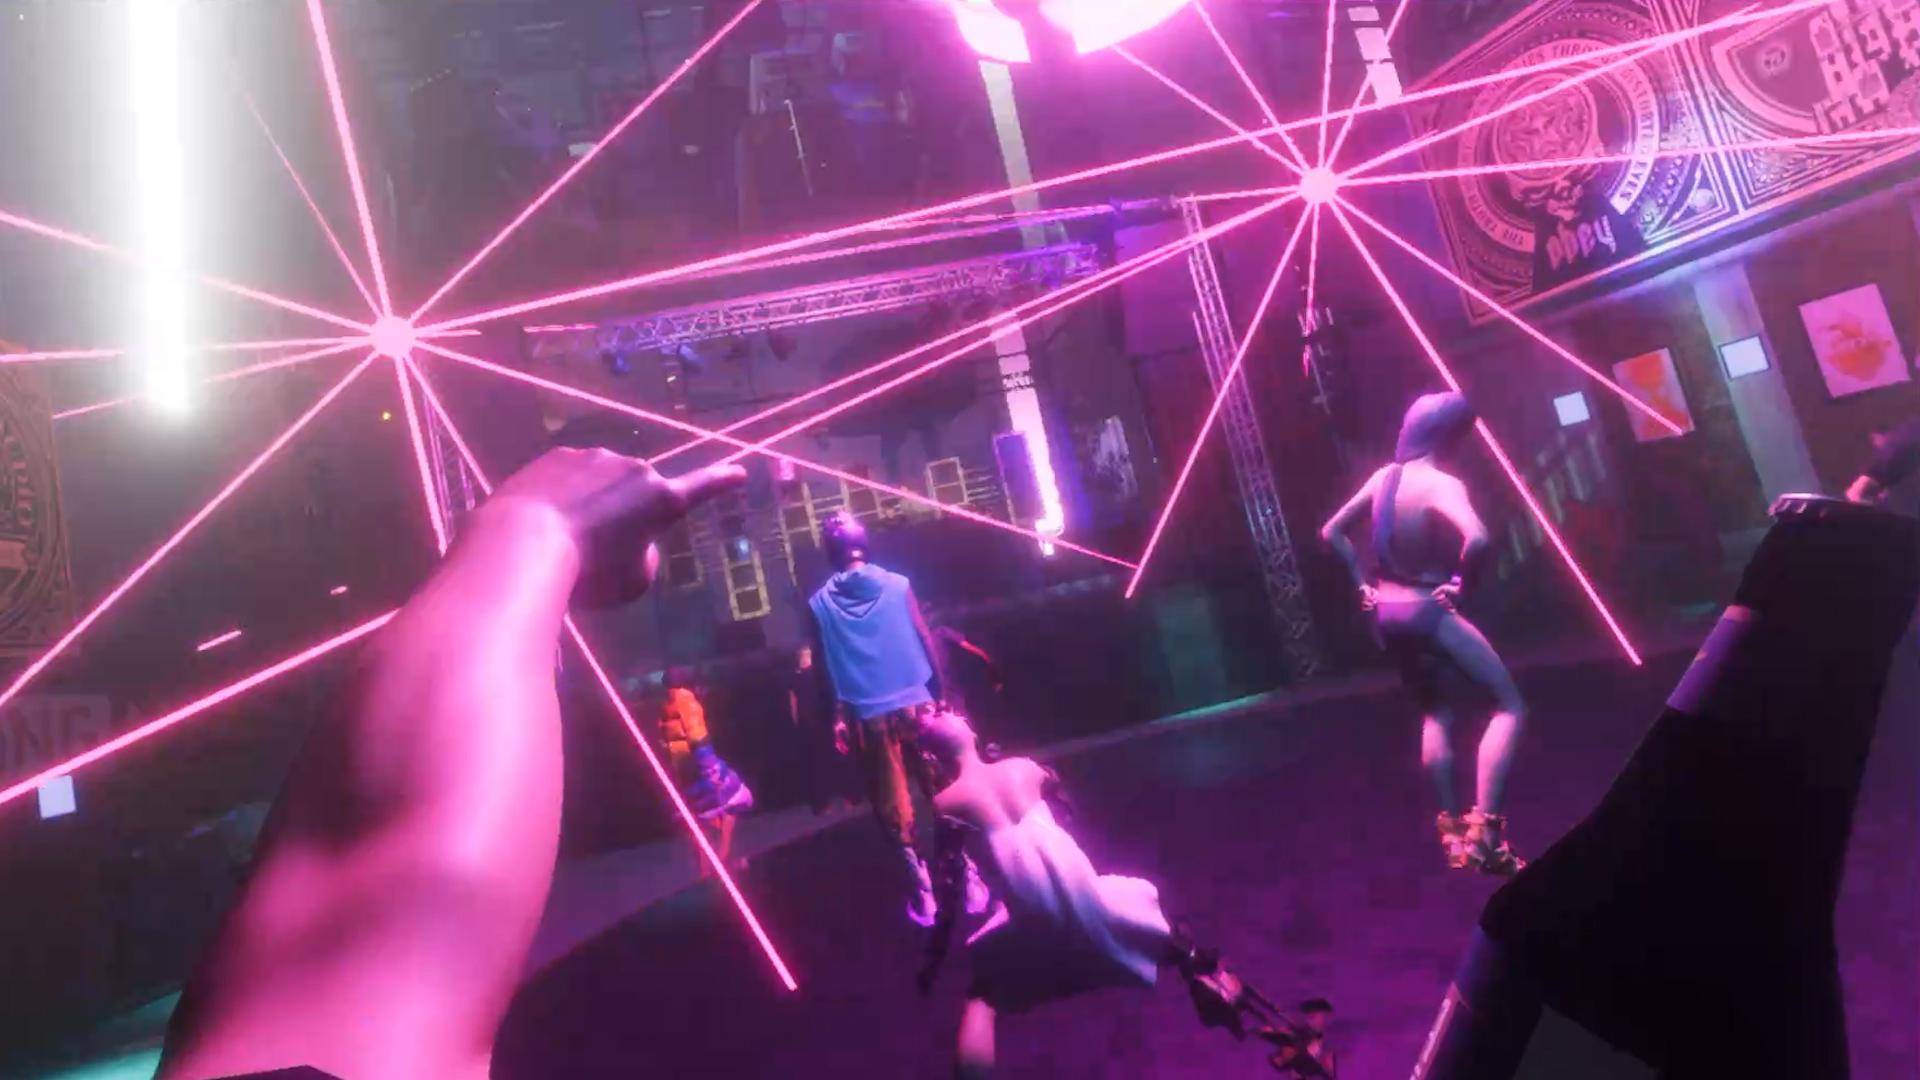 Glastonburry举办大型VR音乐艺术节Lost Horizon,开创未来音乐节新形态